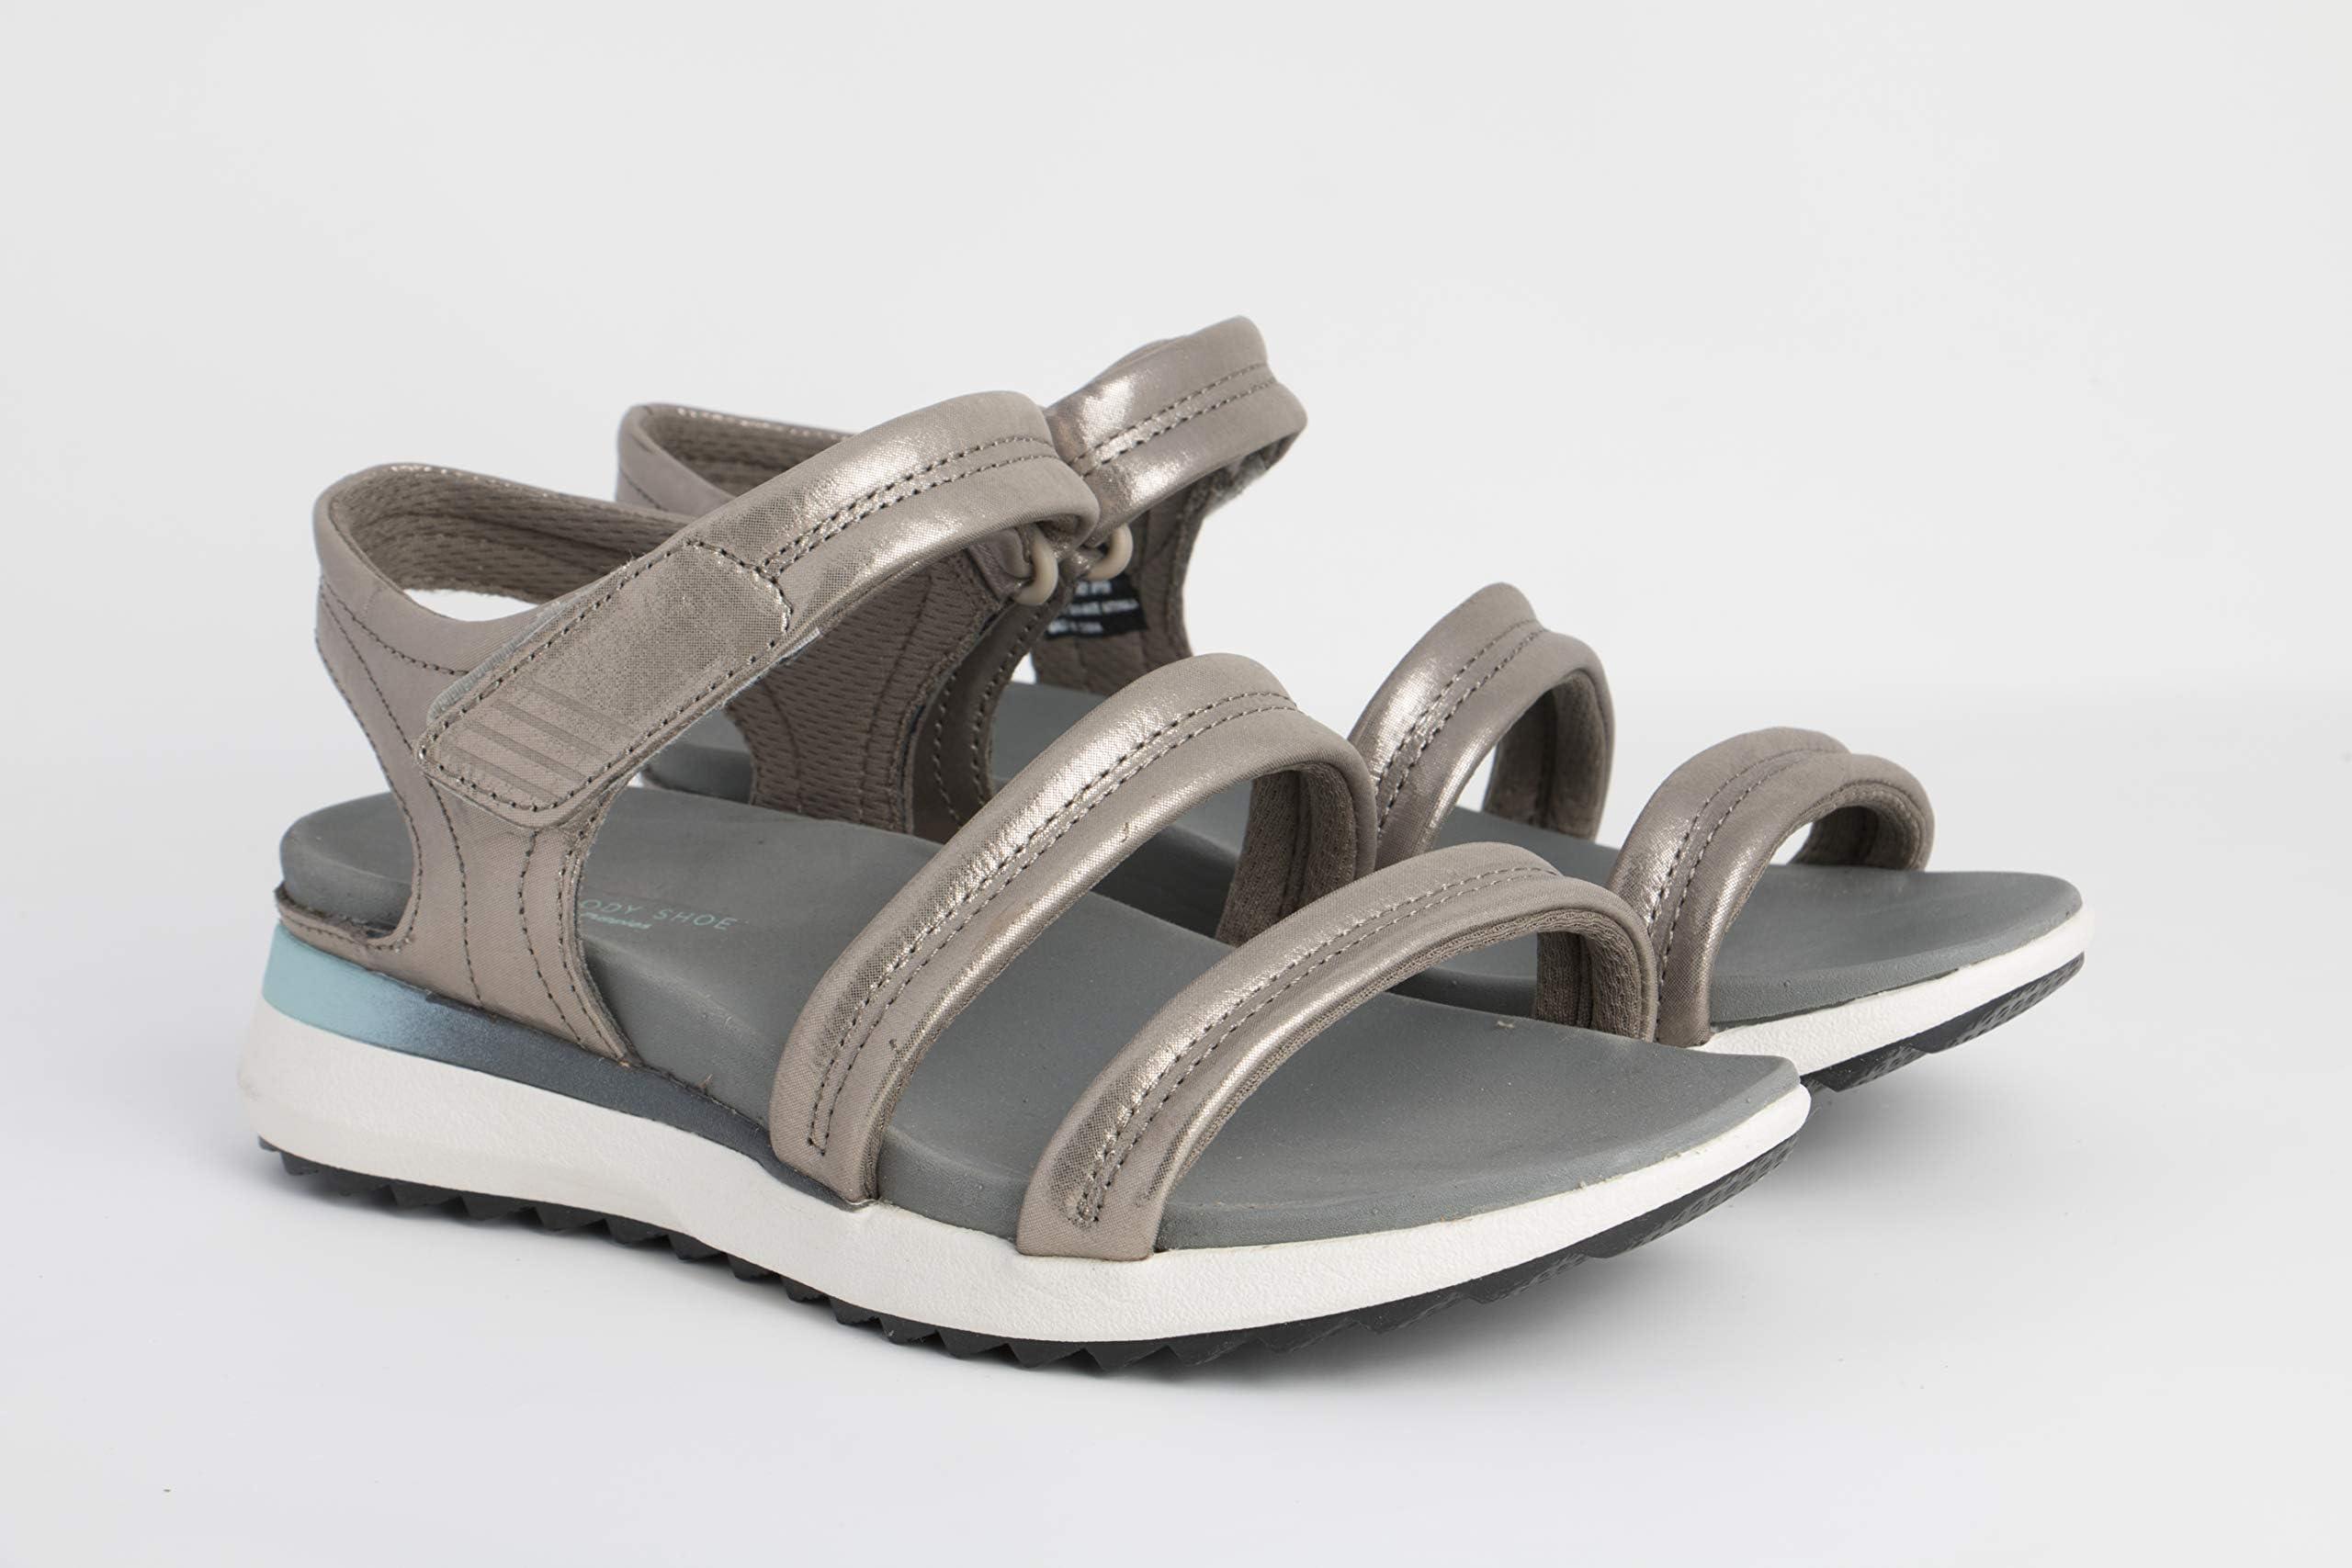 hush puppies sandals price